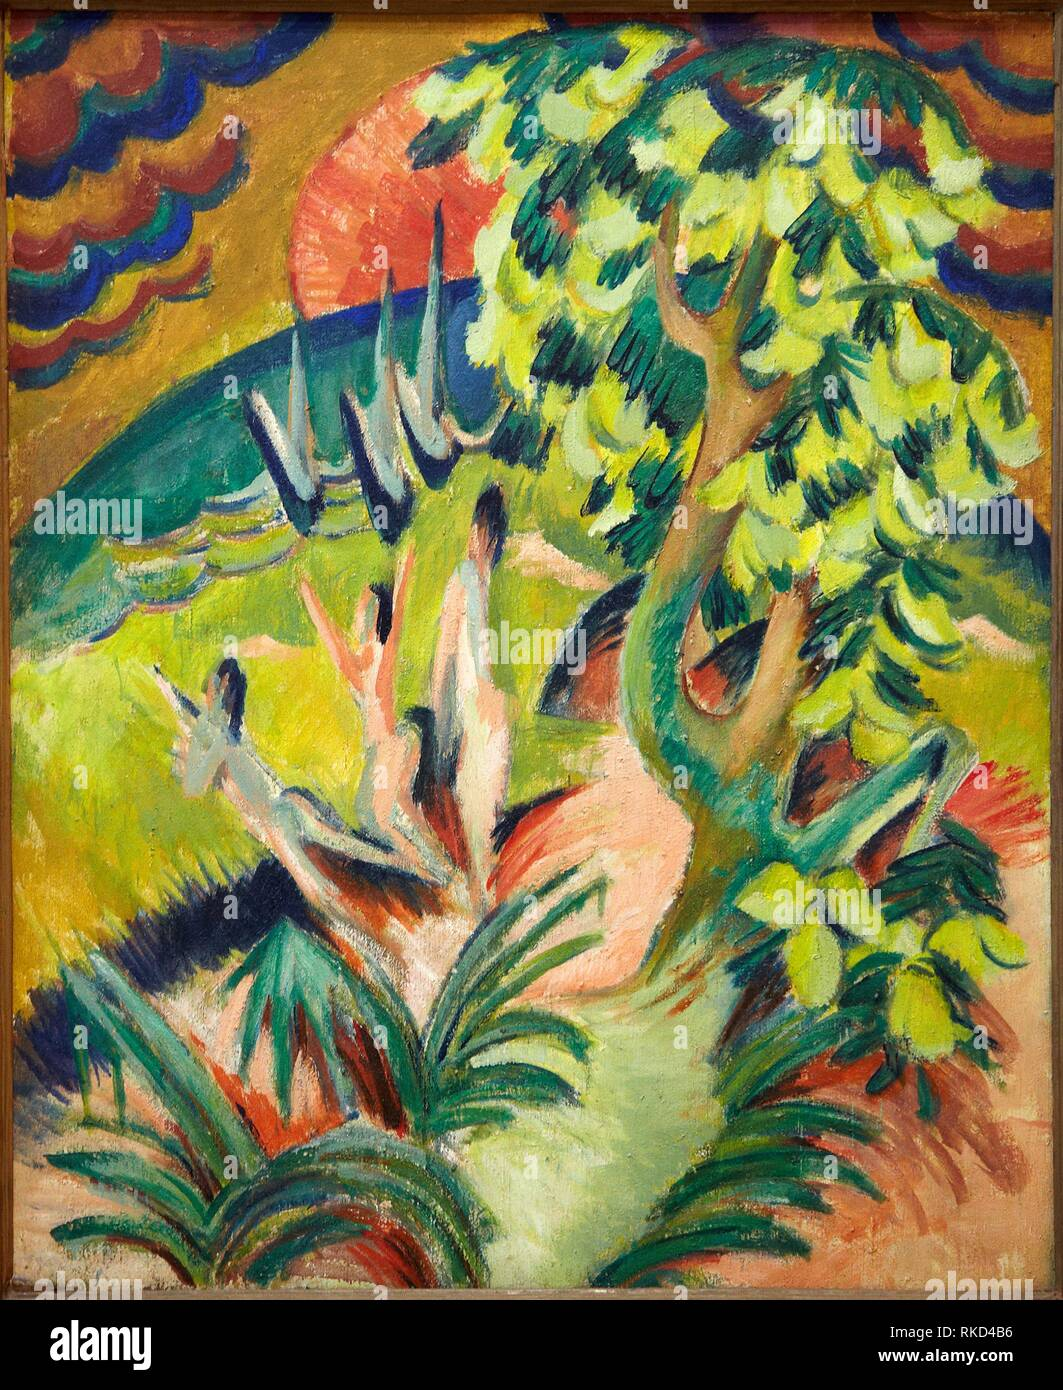 '''Curving Bay'', 1914, Ernst Ludwig Kirchner, Thyssen Bornemisza Museum, Madrid, Spain - Stock Image